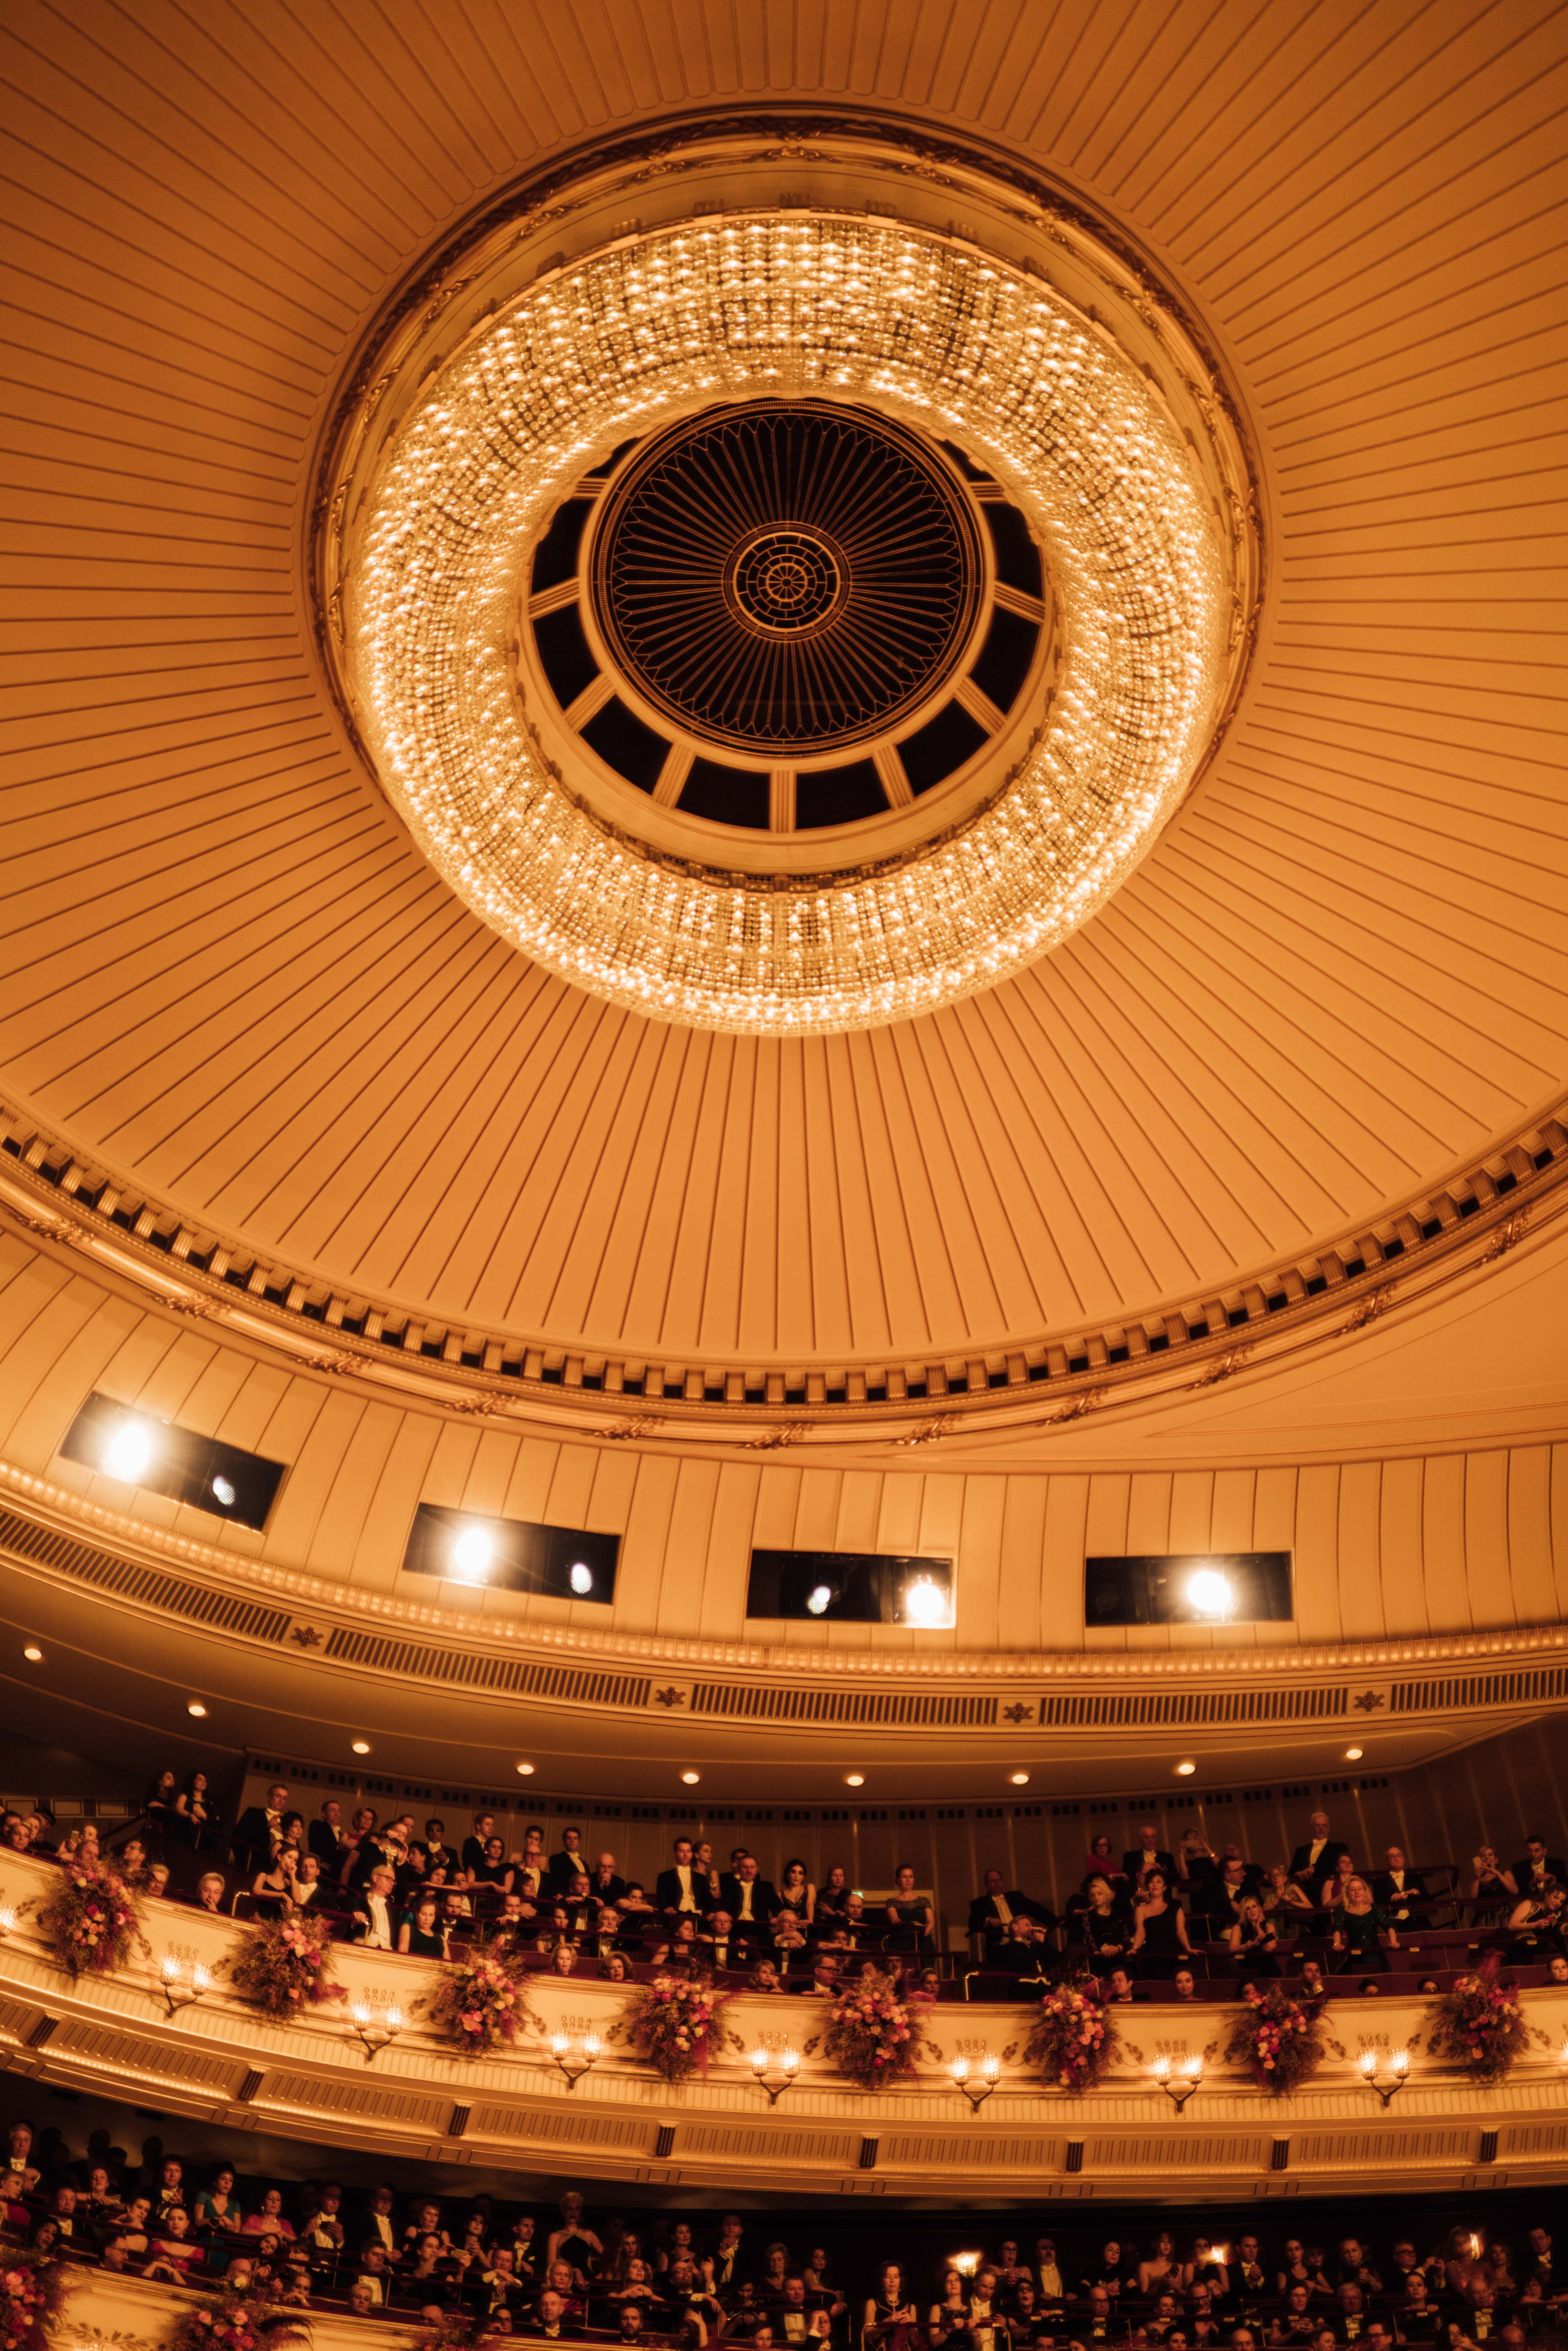 Vienna Opera Ball 2017: A Fairytale Moment   You rock my life